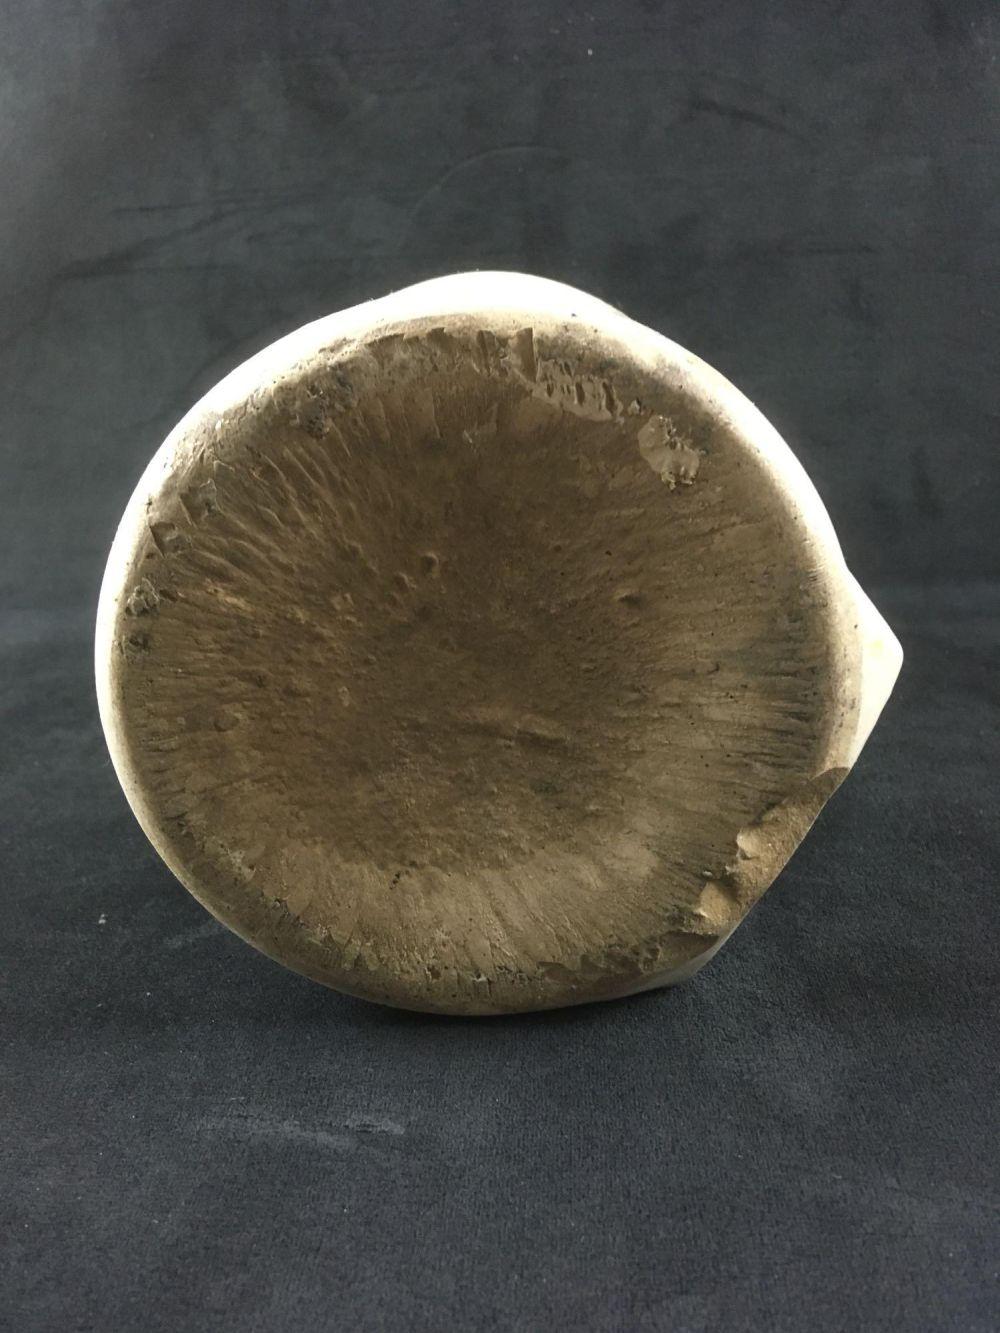 Lot 932: 2 Large Antique Salt Glazed Ceramic Jugs